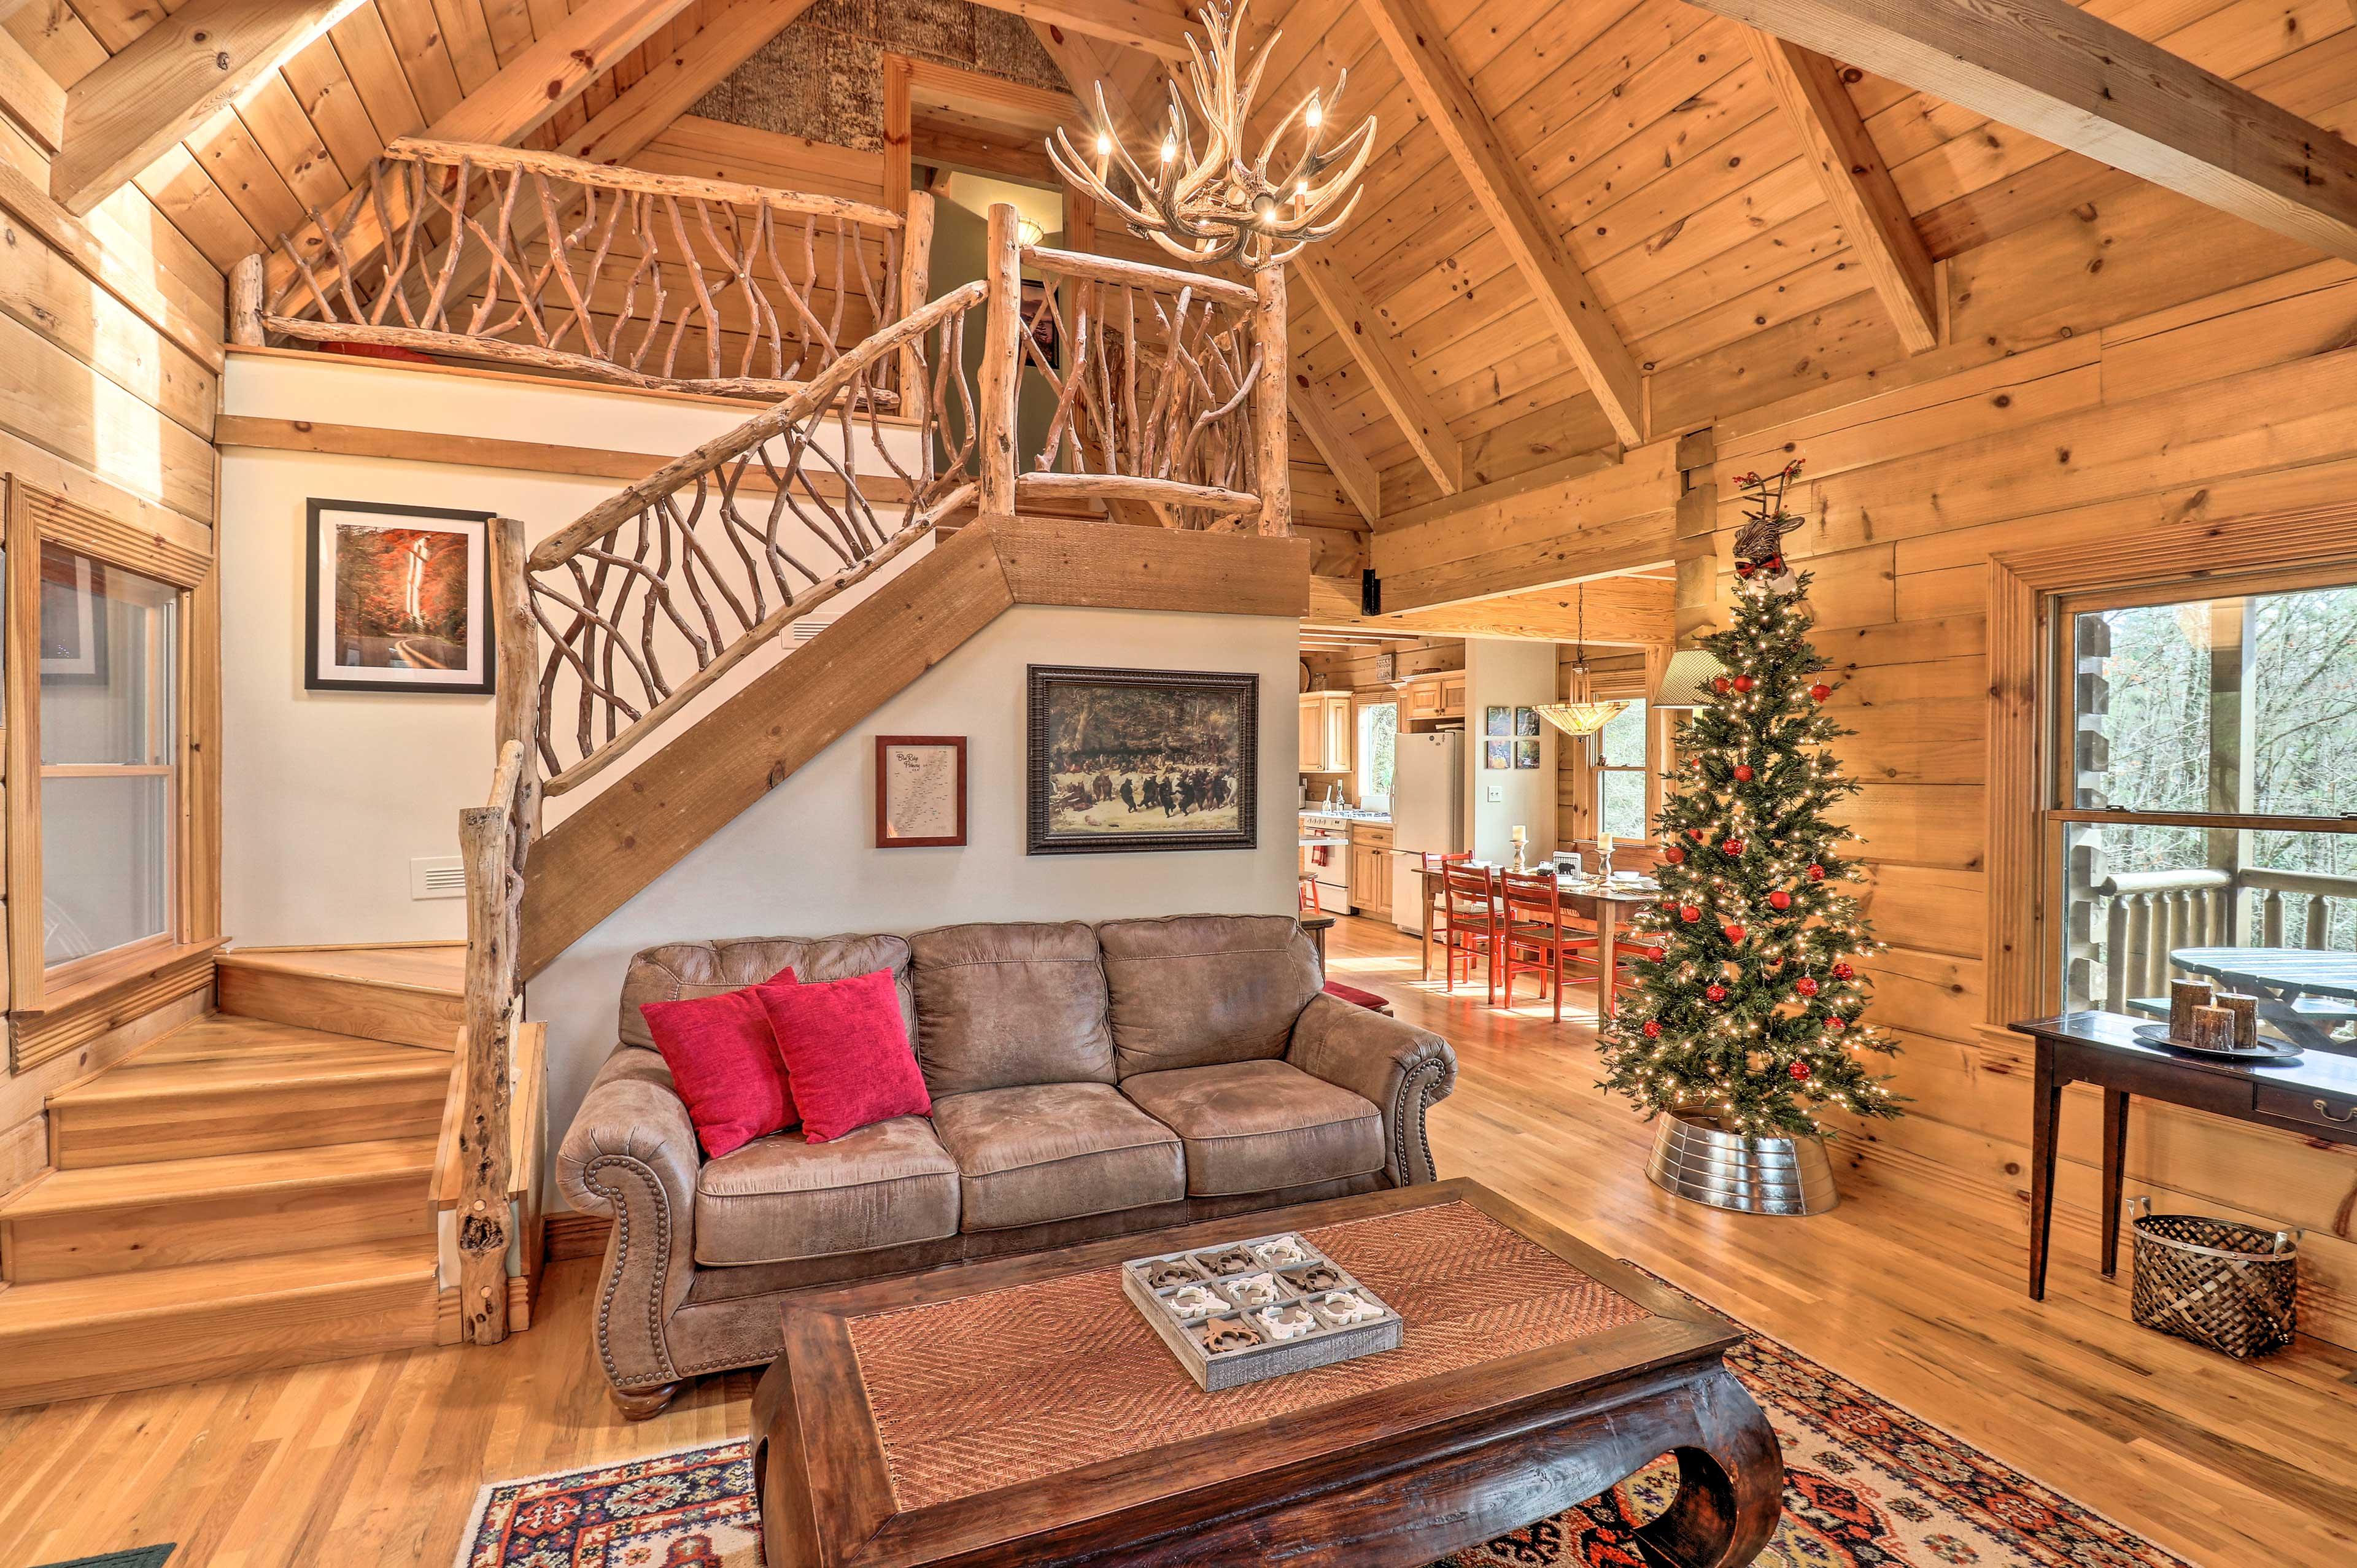 Living Room | Seasonal Decor | Dining Table